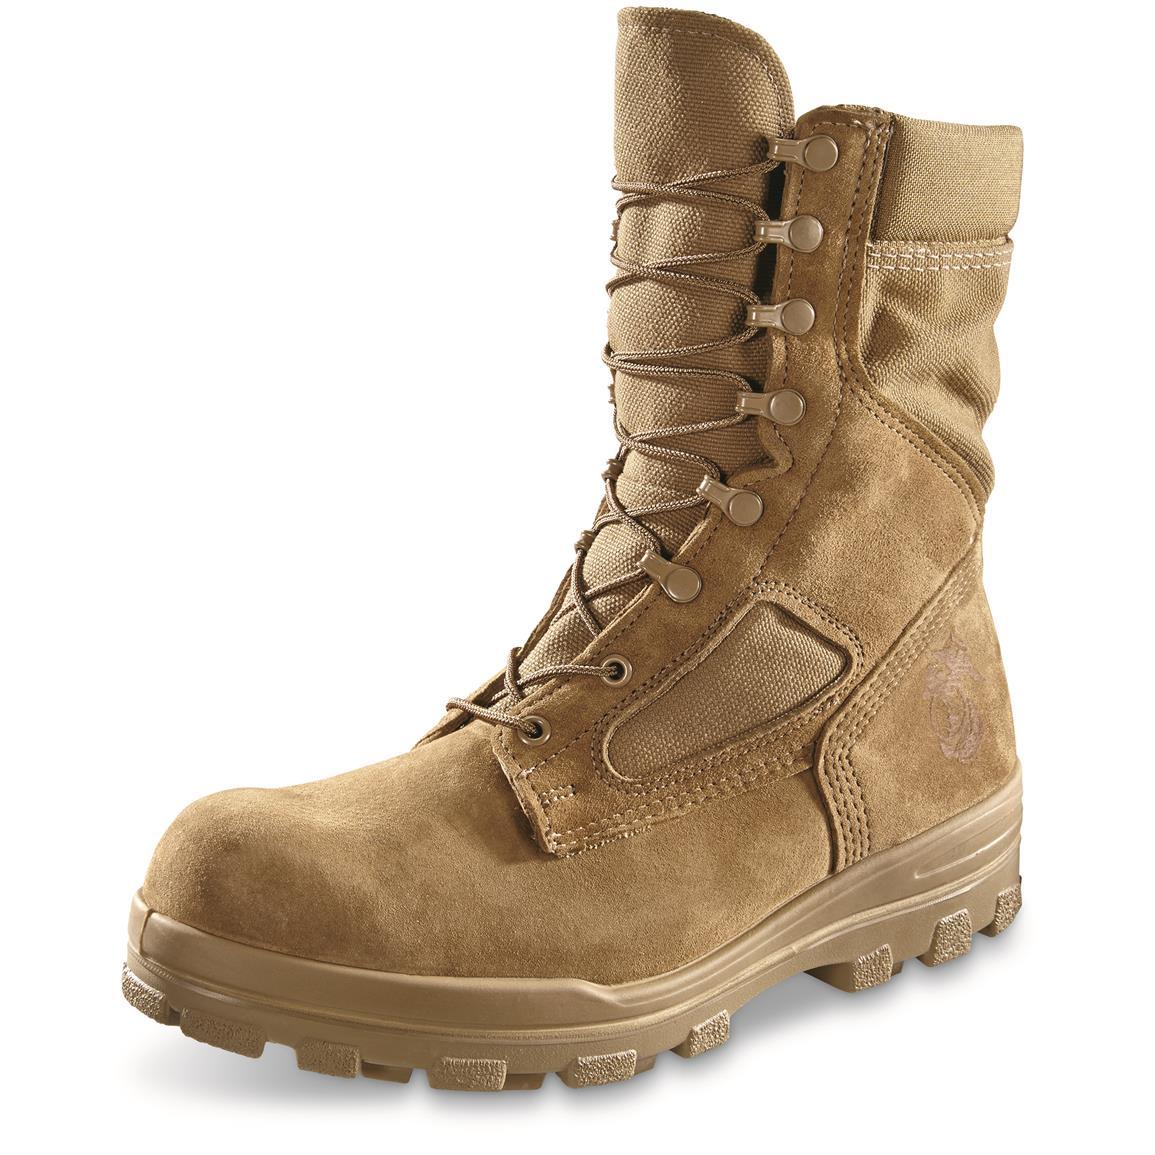 u.s.m.c. military surplus temperate weather waterproof combat boots, new cerclox